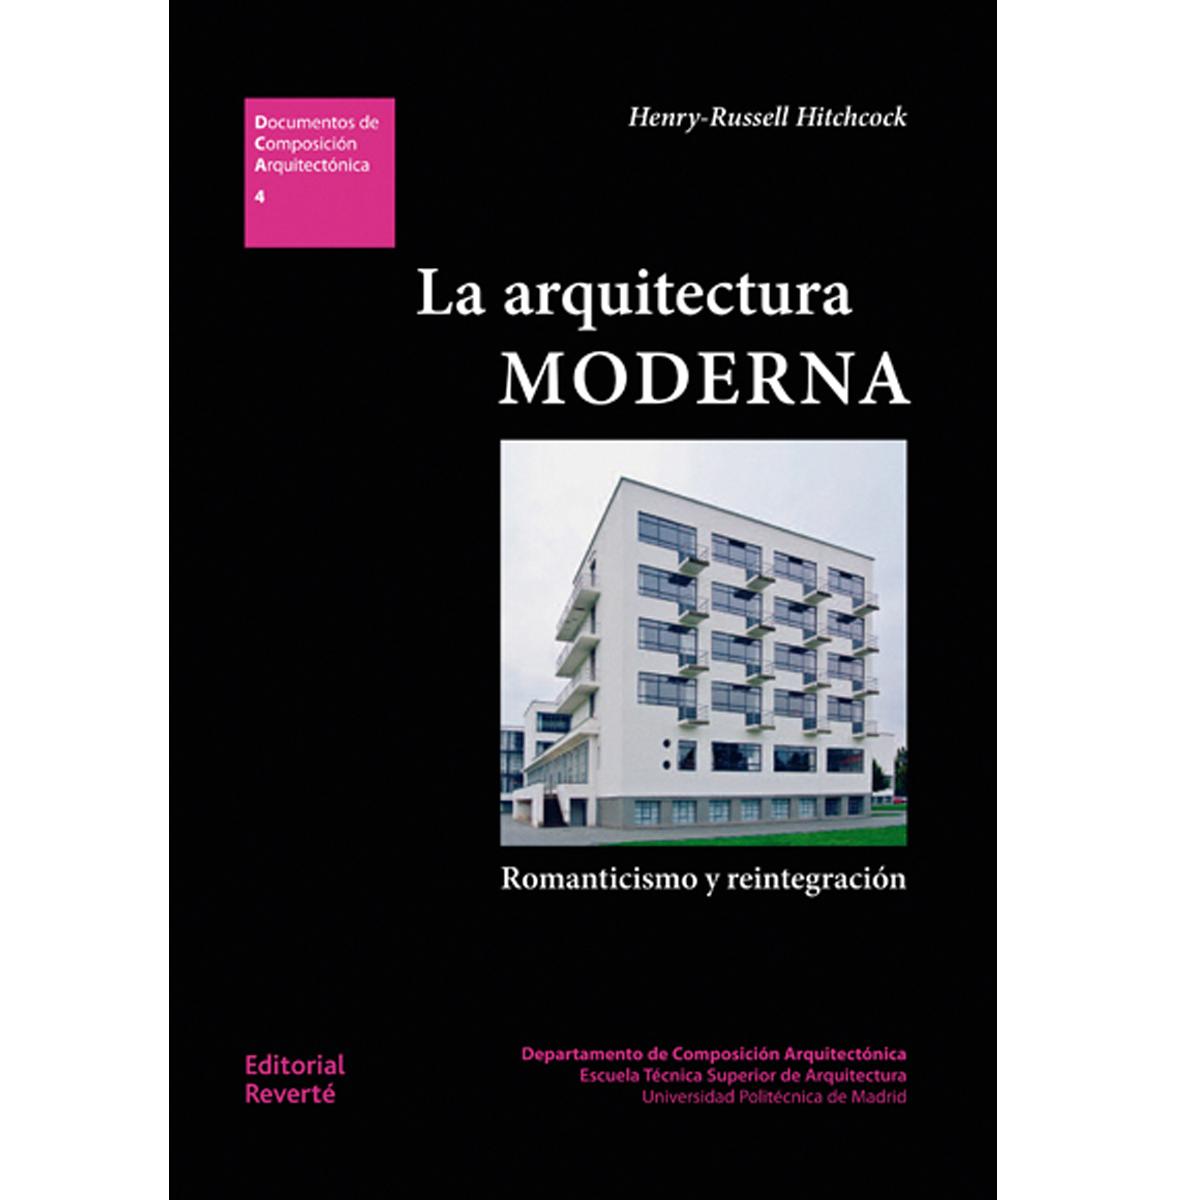 La arquitectura moderna